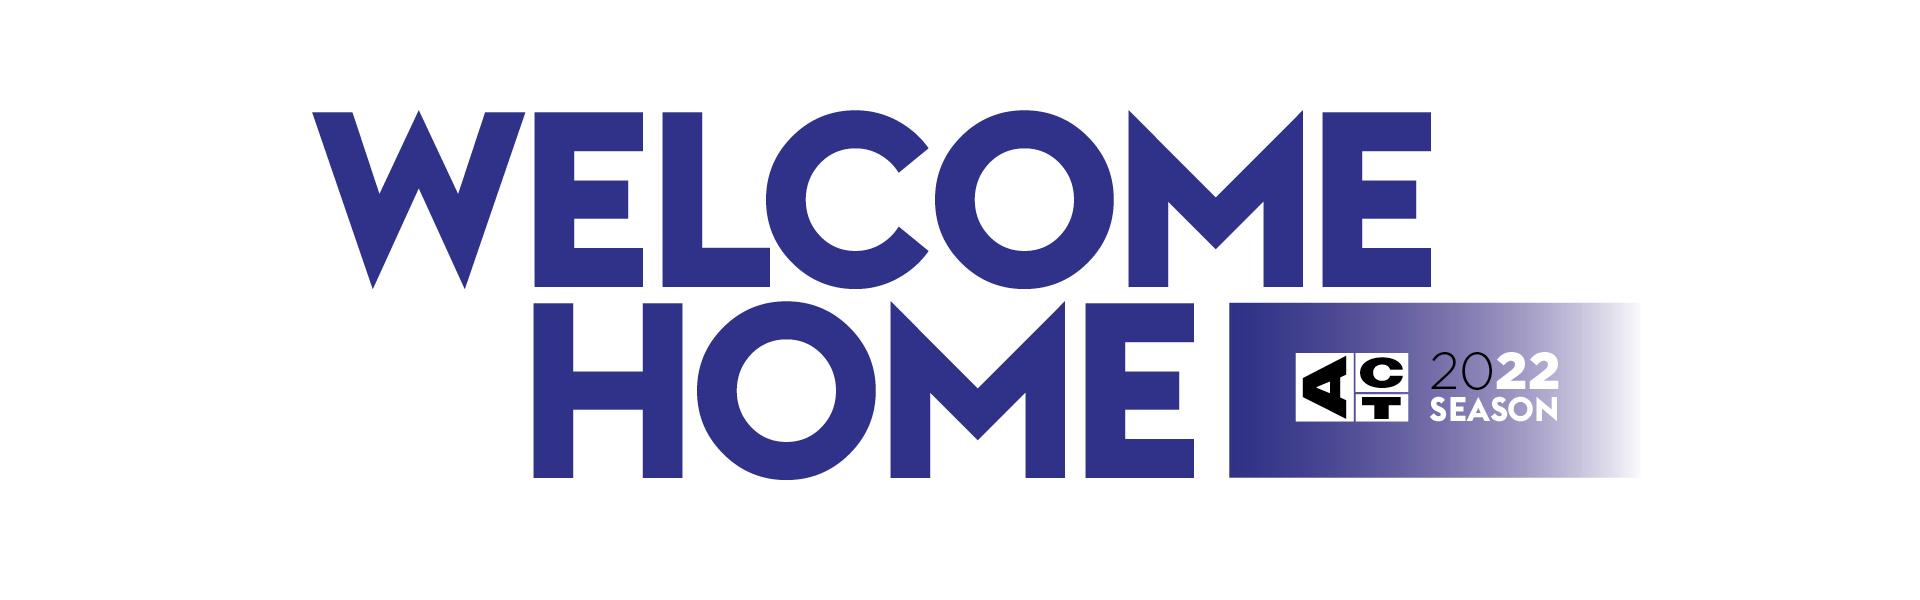 Welcome Home - ACT 2022 Season